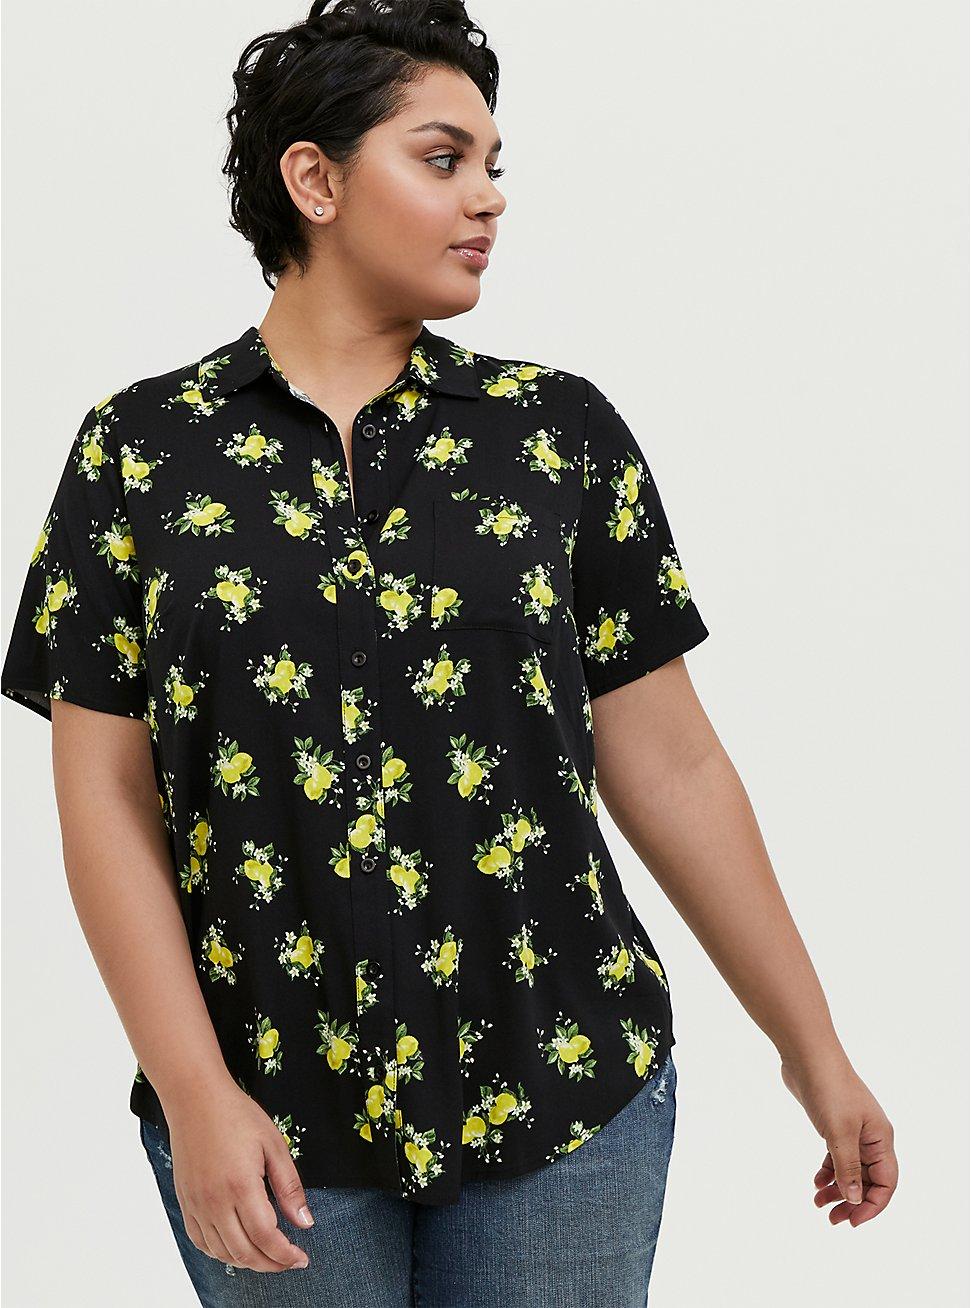 Black Lemon Print Challis Button Front Shirt, LEMONS - BLACK, hi-res